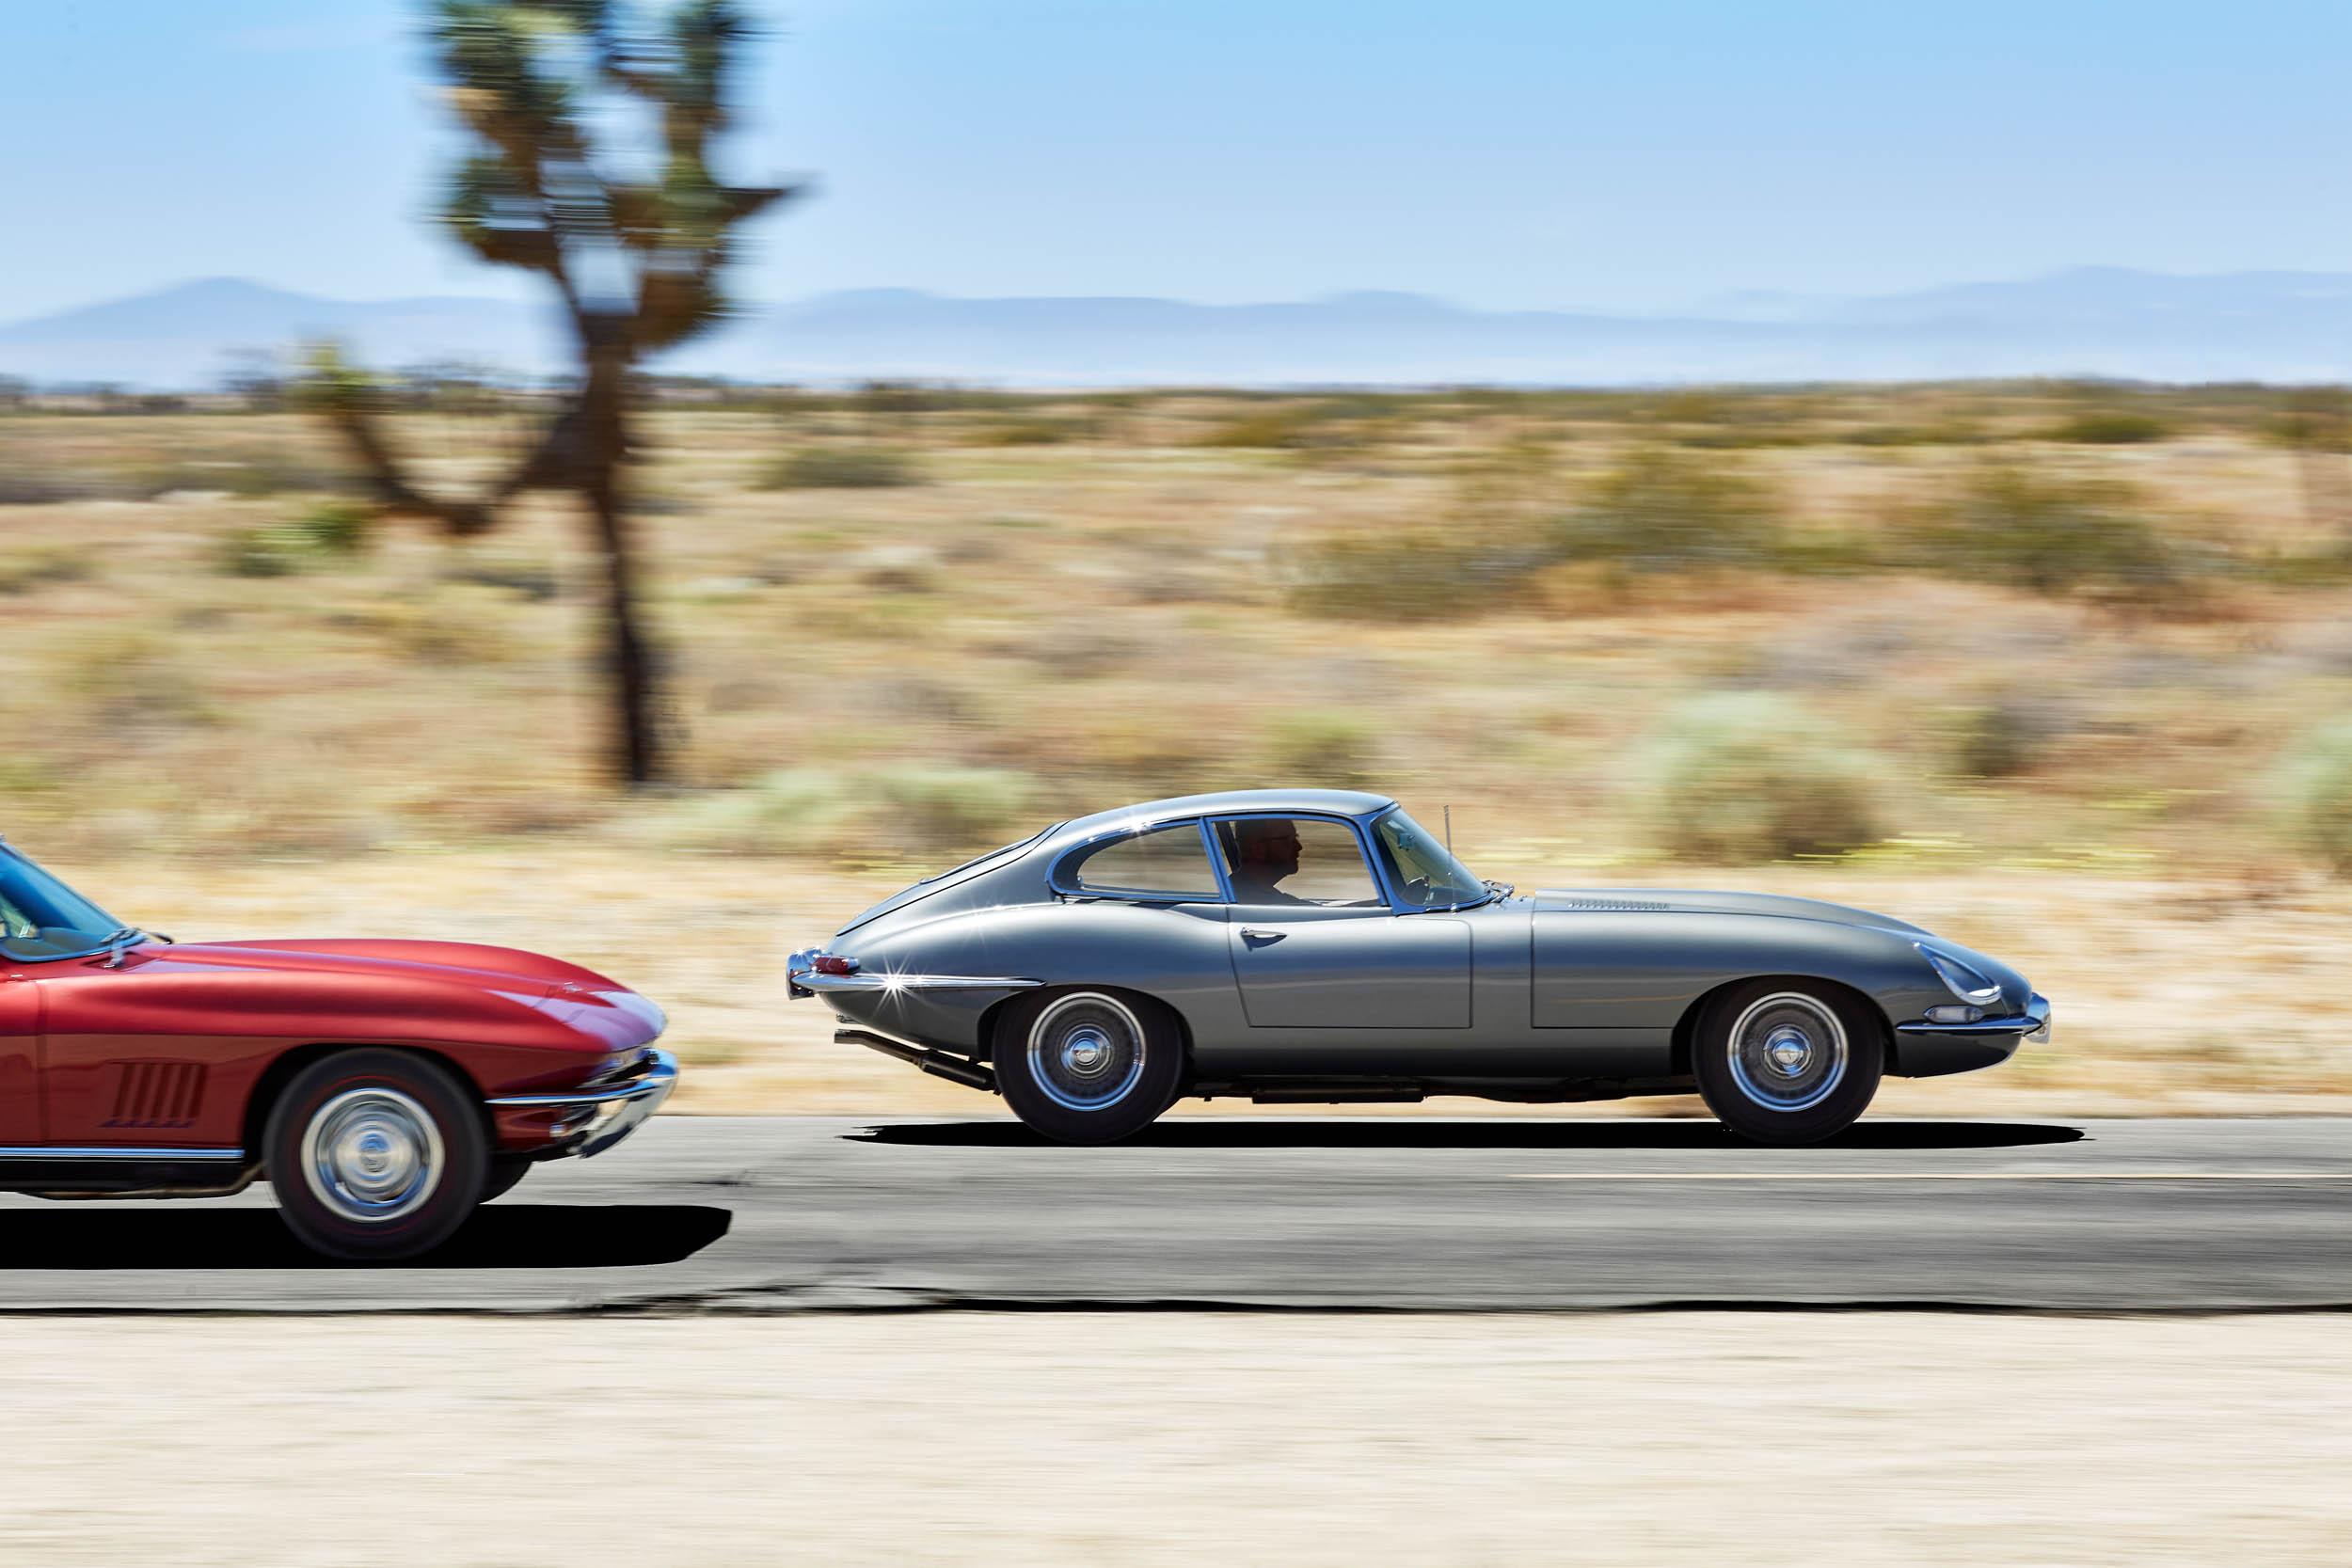 1967 Jaguar E-type and 1967 Chevrolet Corvette